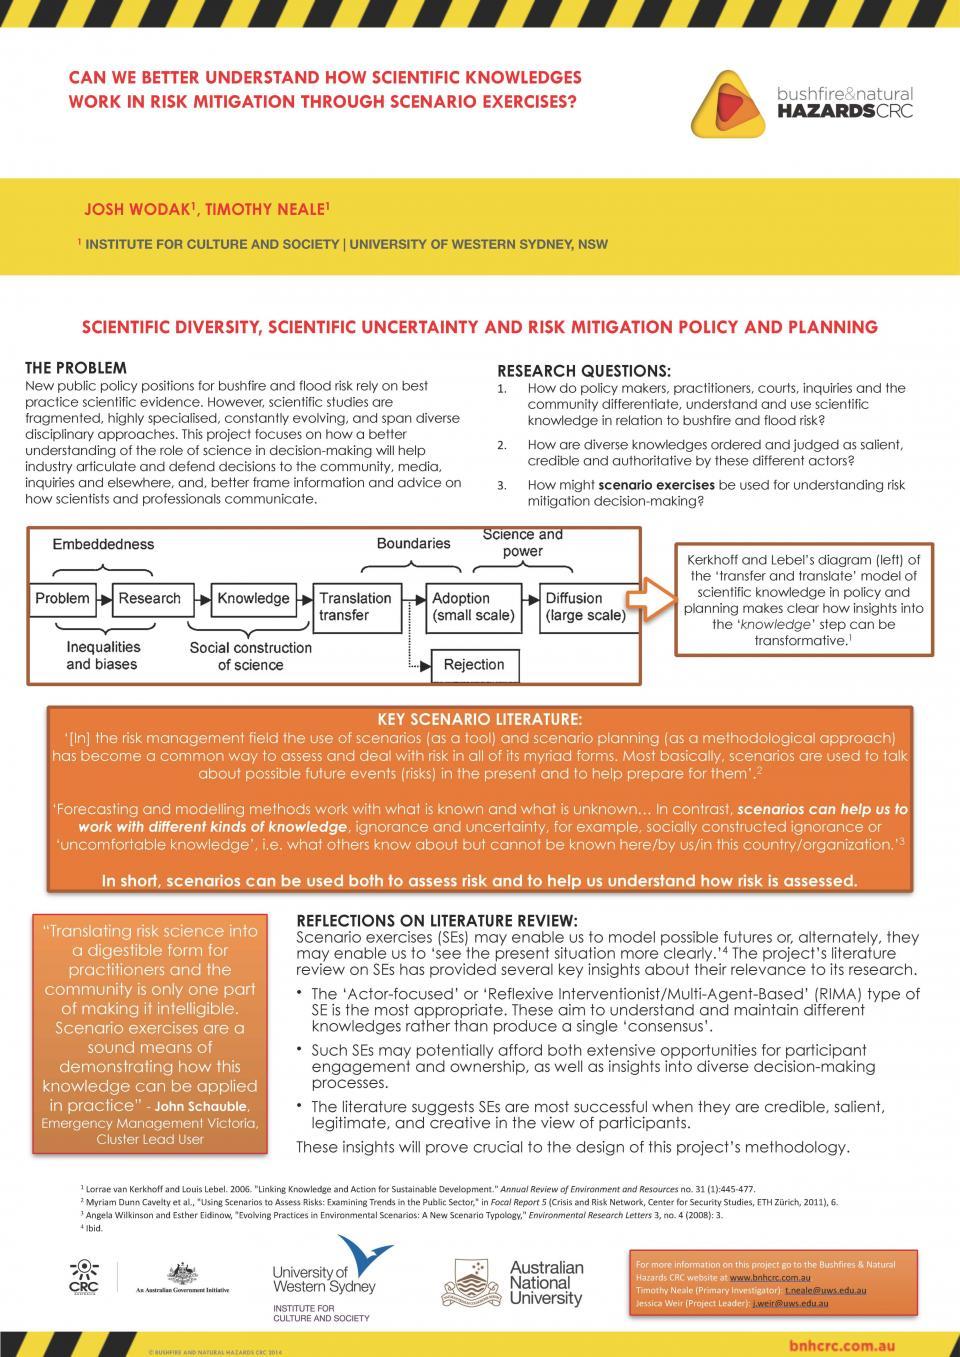 Can we better understand how scientific knowledges work in risk mitigation through scenario exercises?